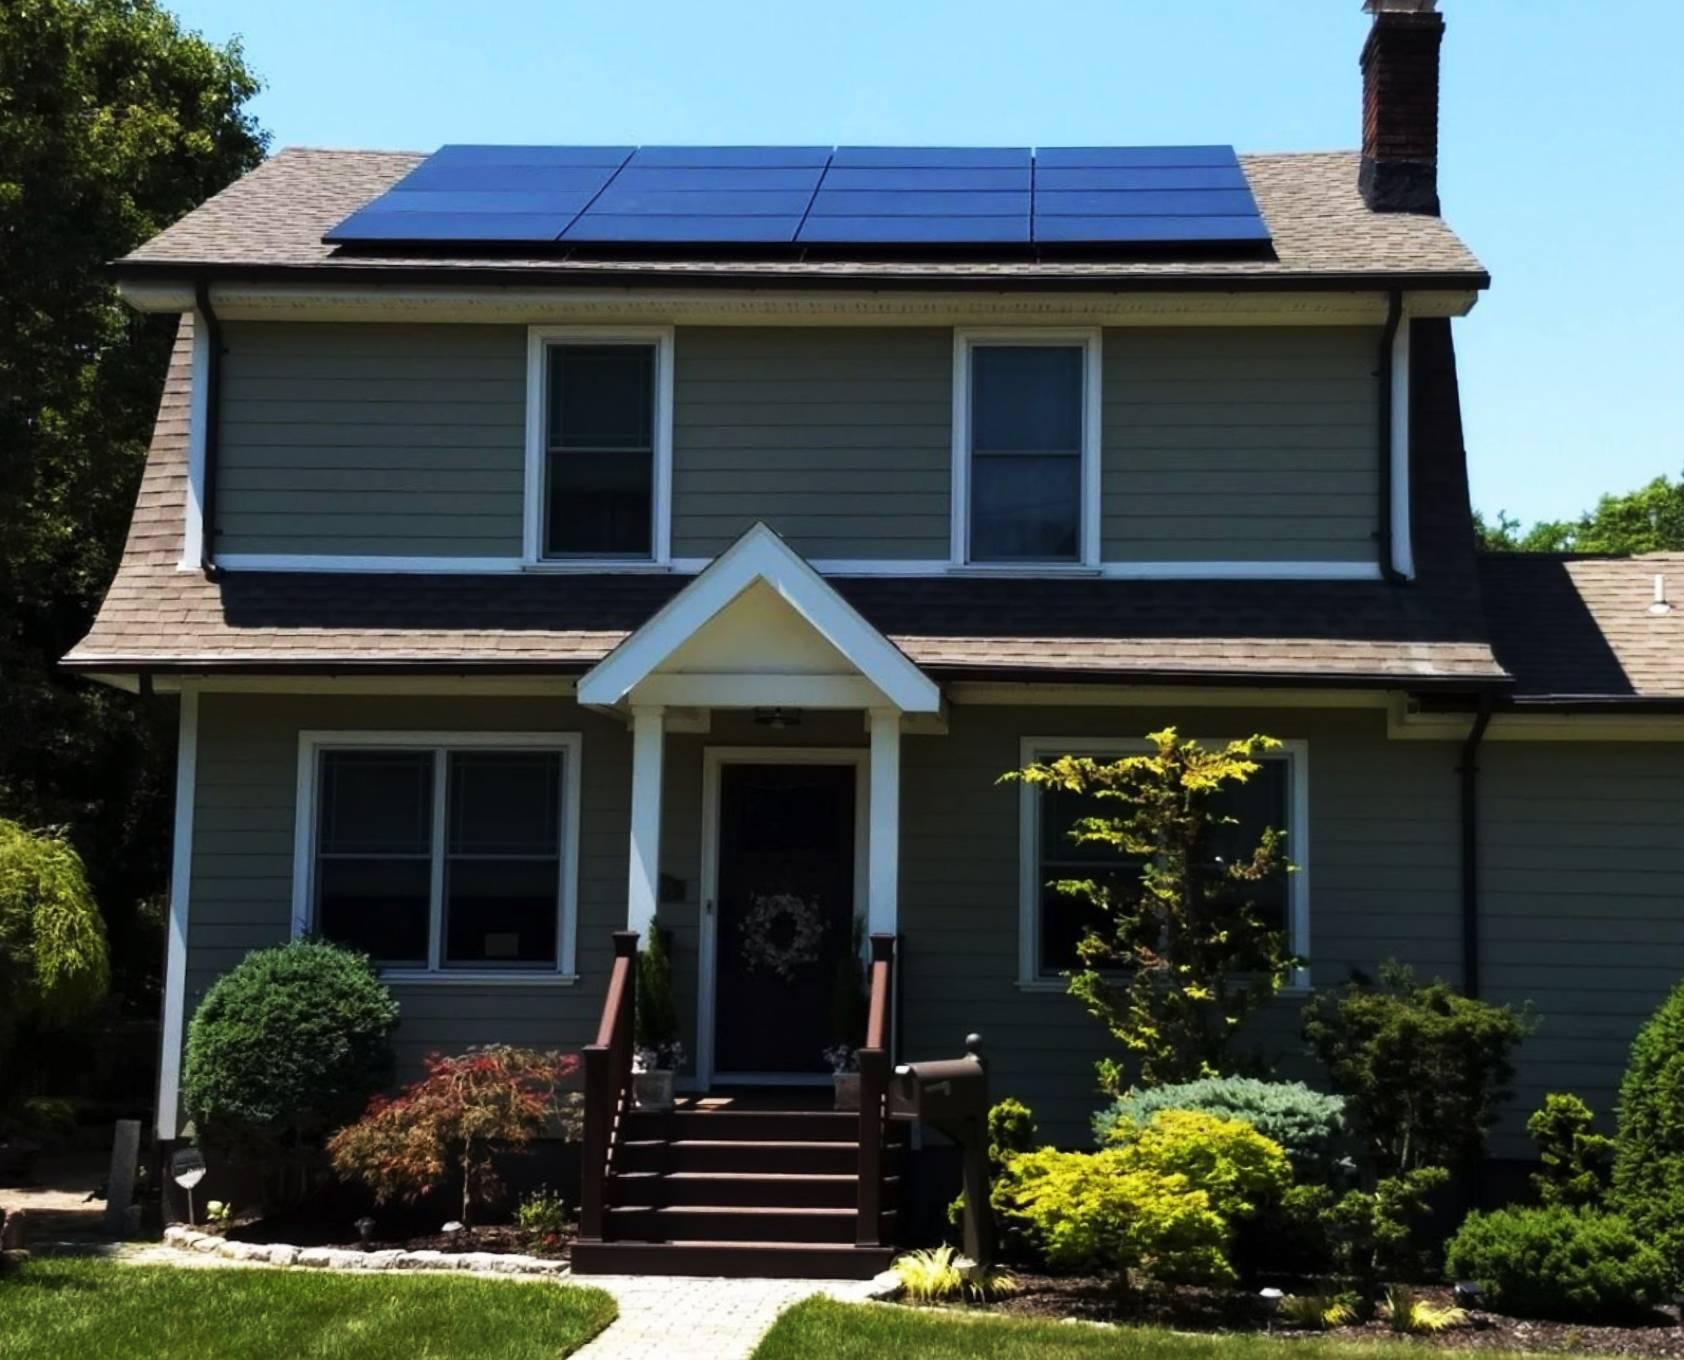 solar-powered home building needs